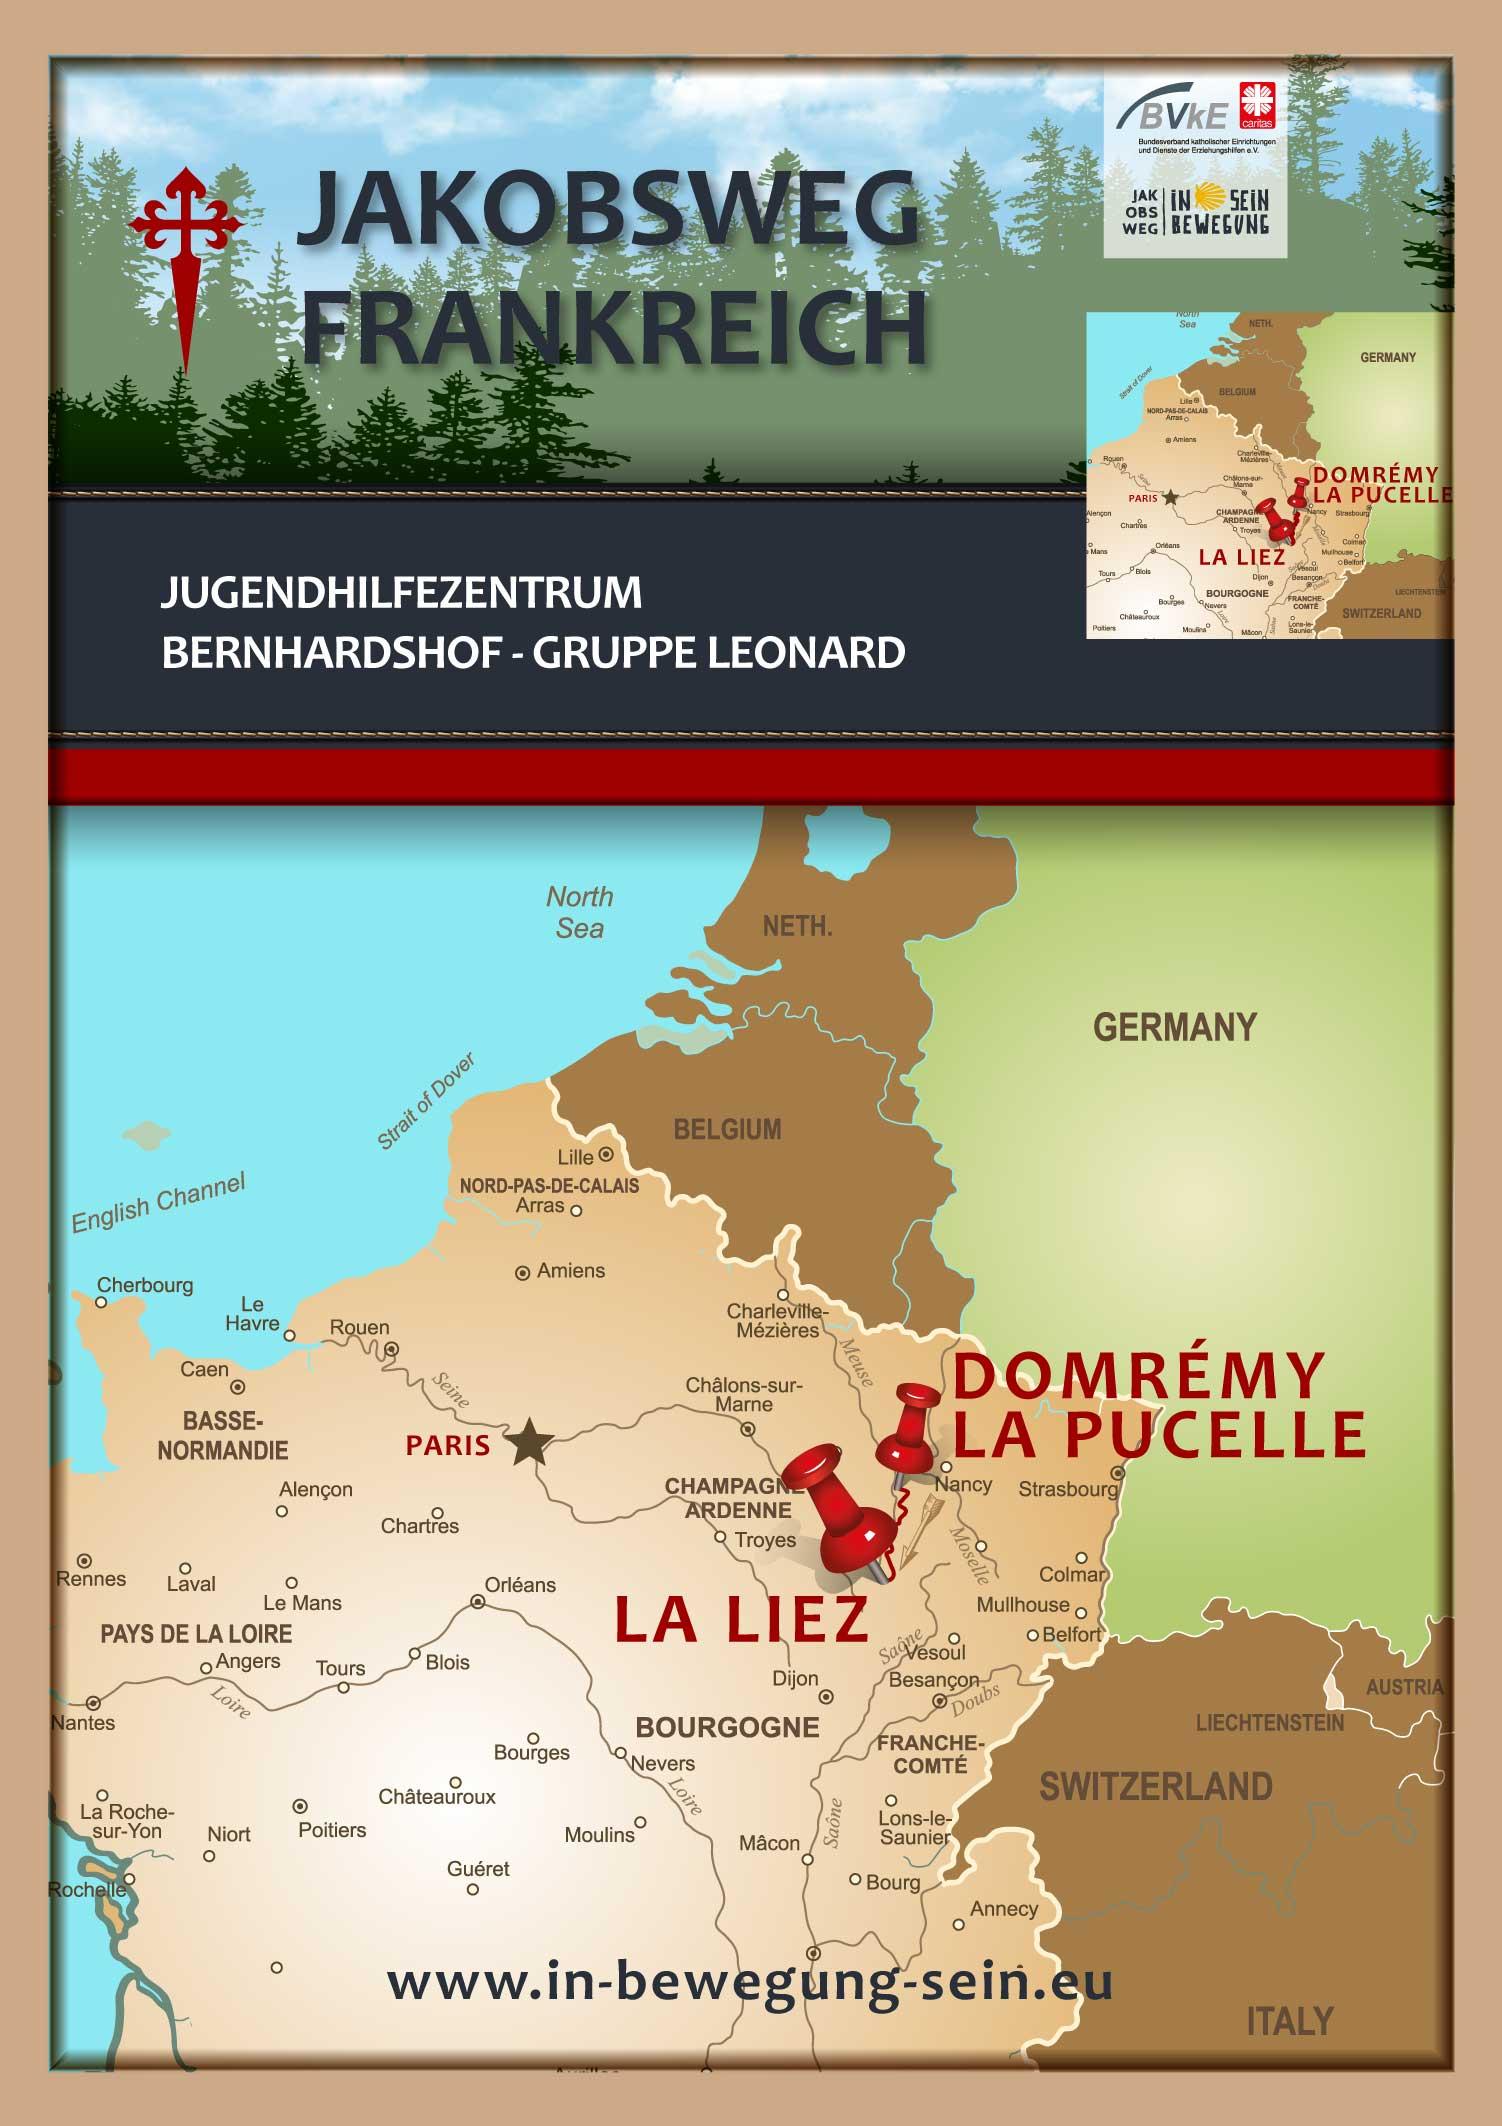 Posterkarte-Gruppe-Jugendhilfezentrum-Bernhardshof-Gruppe-Leonard-17-Juni-2019-